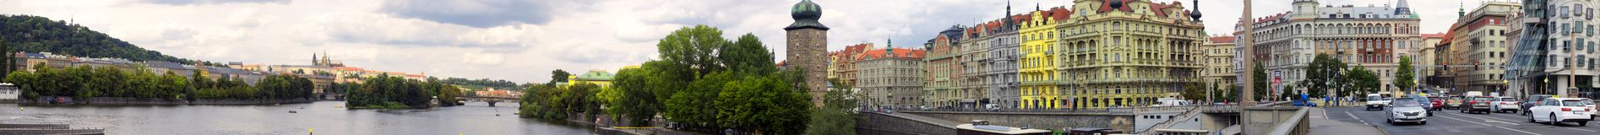 Panoramic view of Jiraskuw most Stock Image